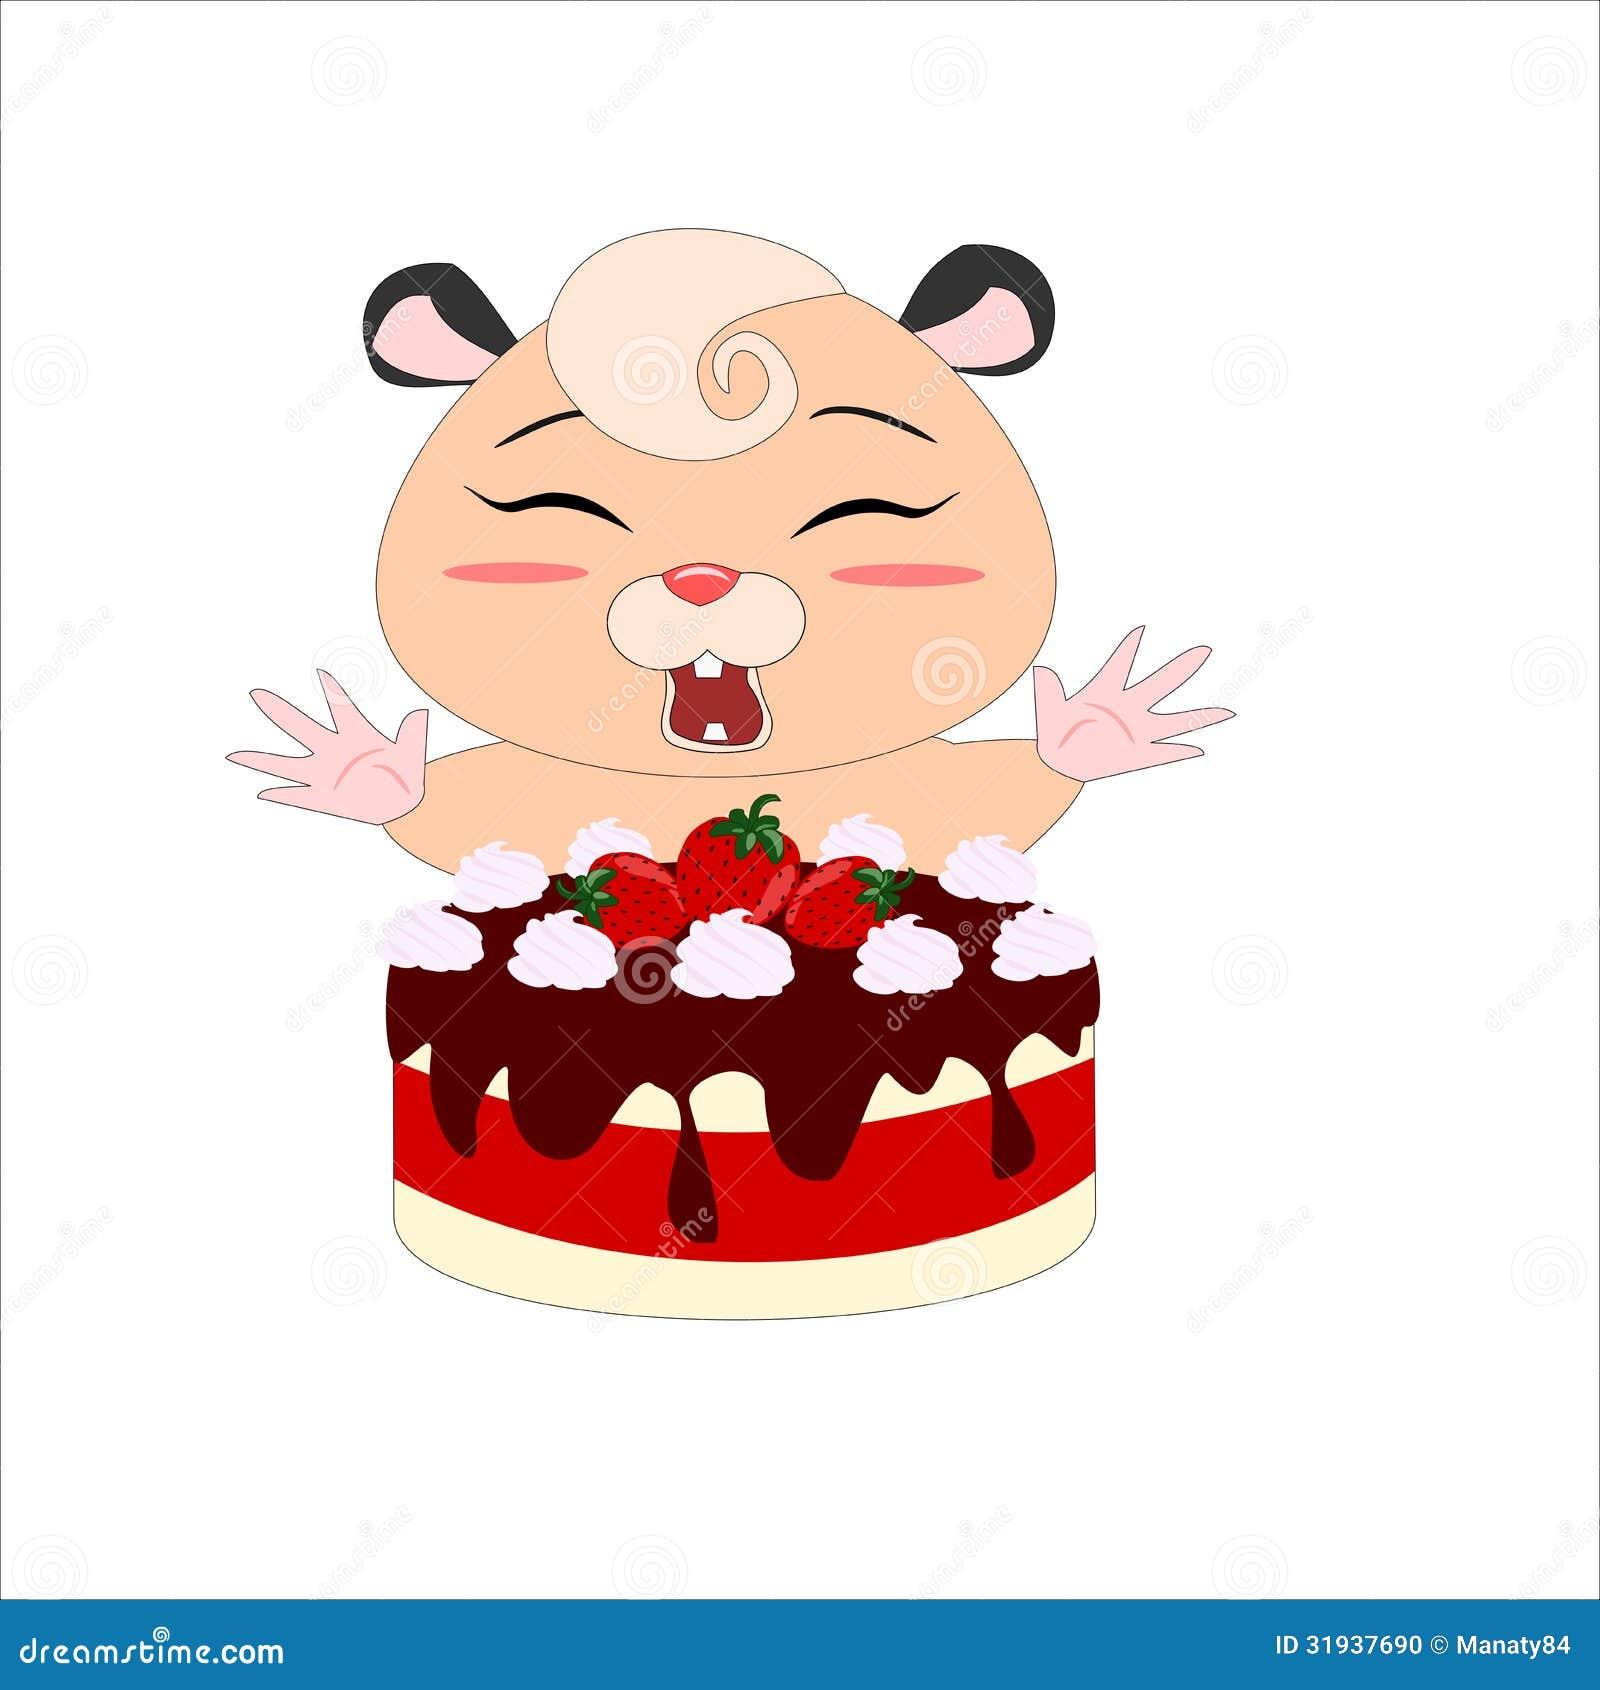 Strawberry Cake Cartoon Images : Cartoon Hamster With Strawberry Cake Stock Photo - Image ...